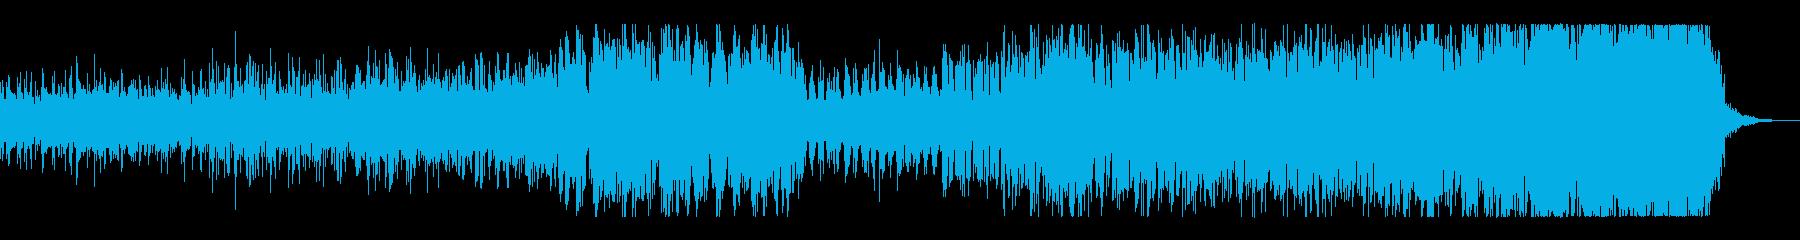 KANT混乱と幻惑201720の再生済みの波形